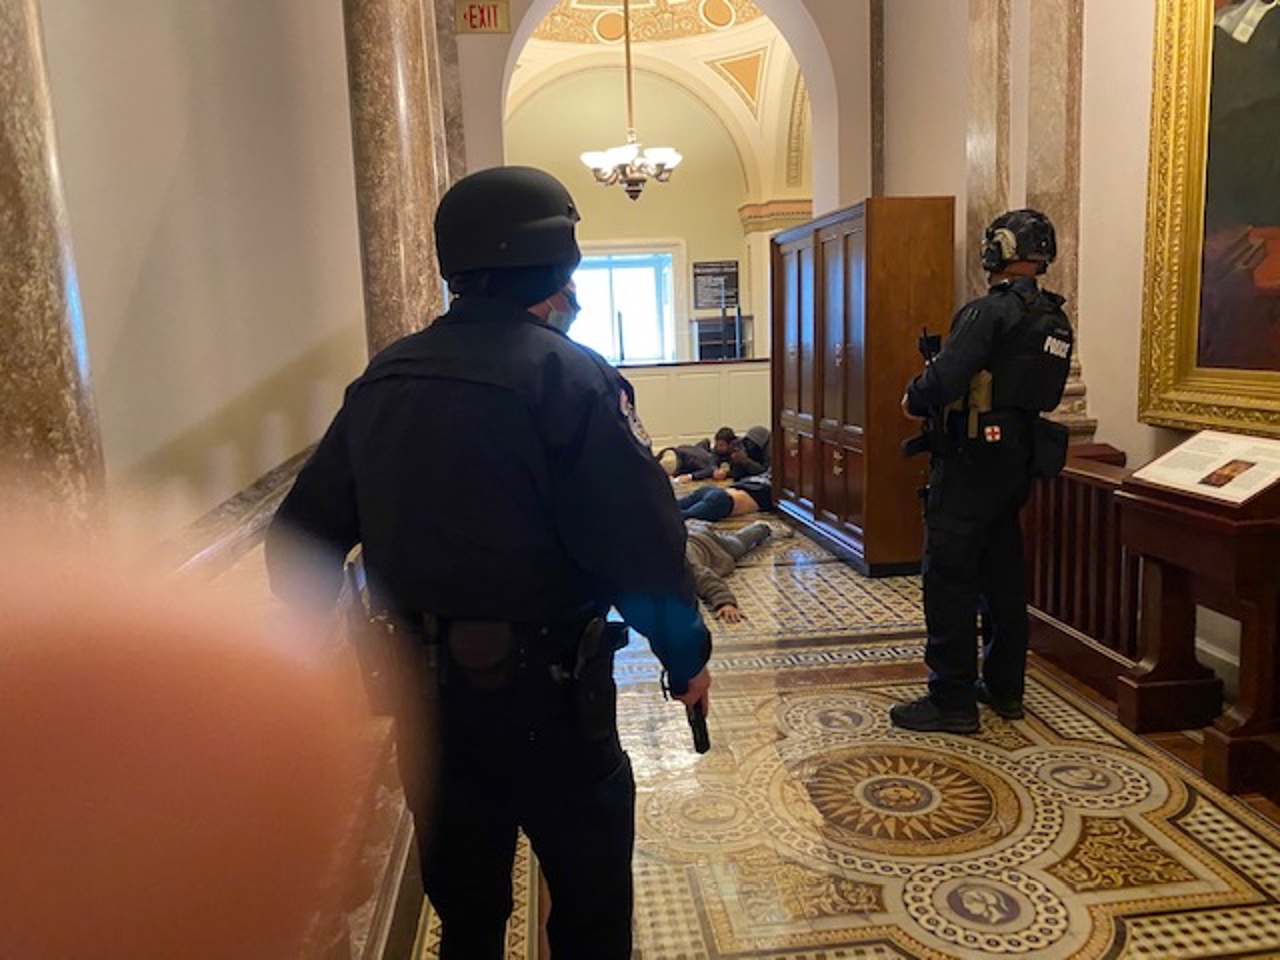 Jim Costa Photo, Arrests Inside Capitol